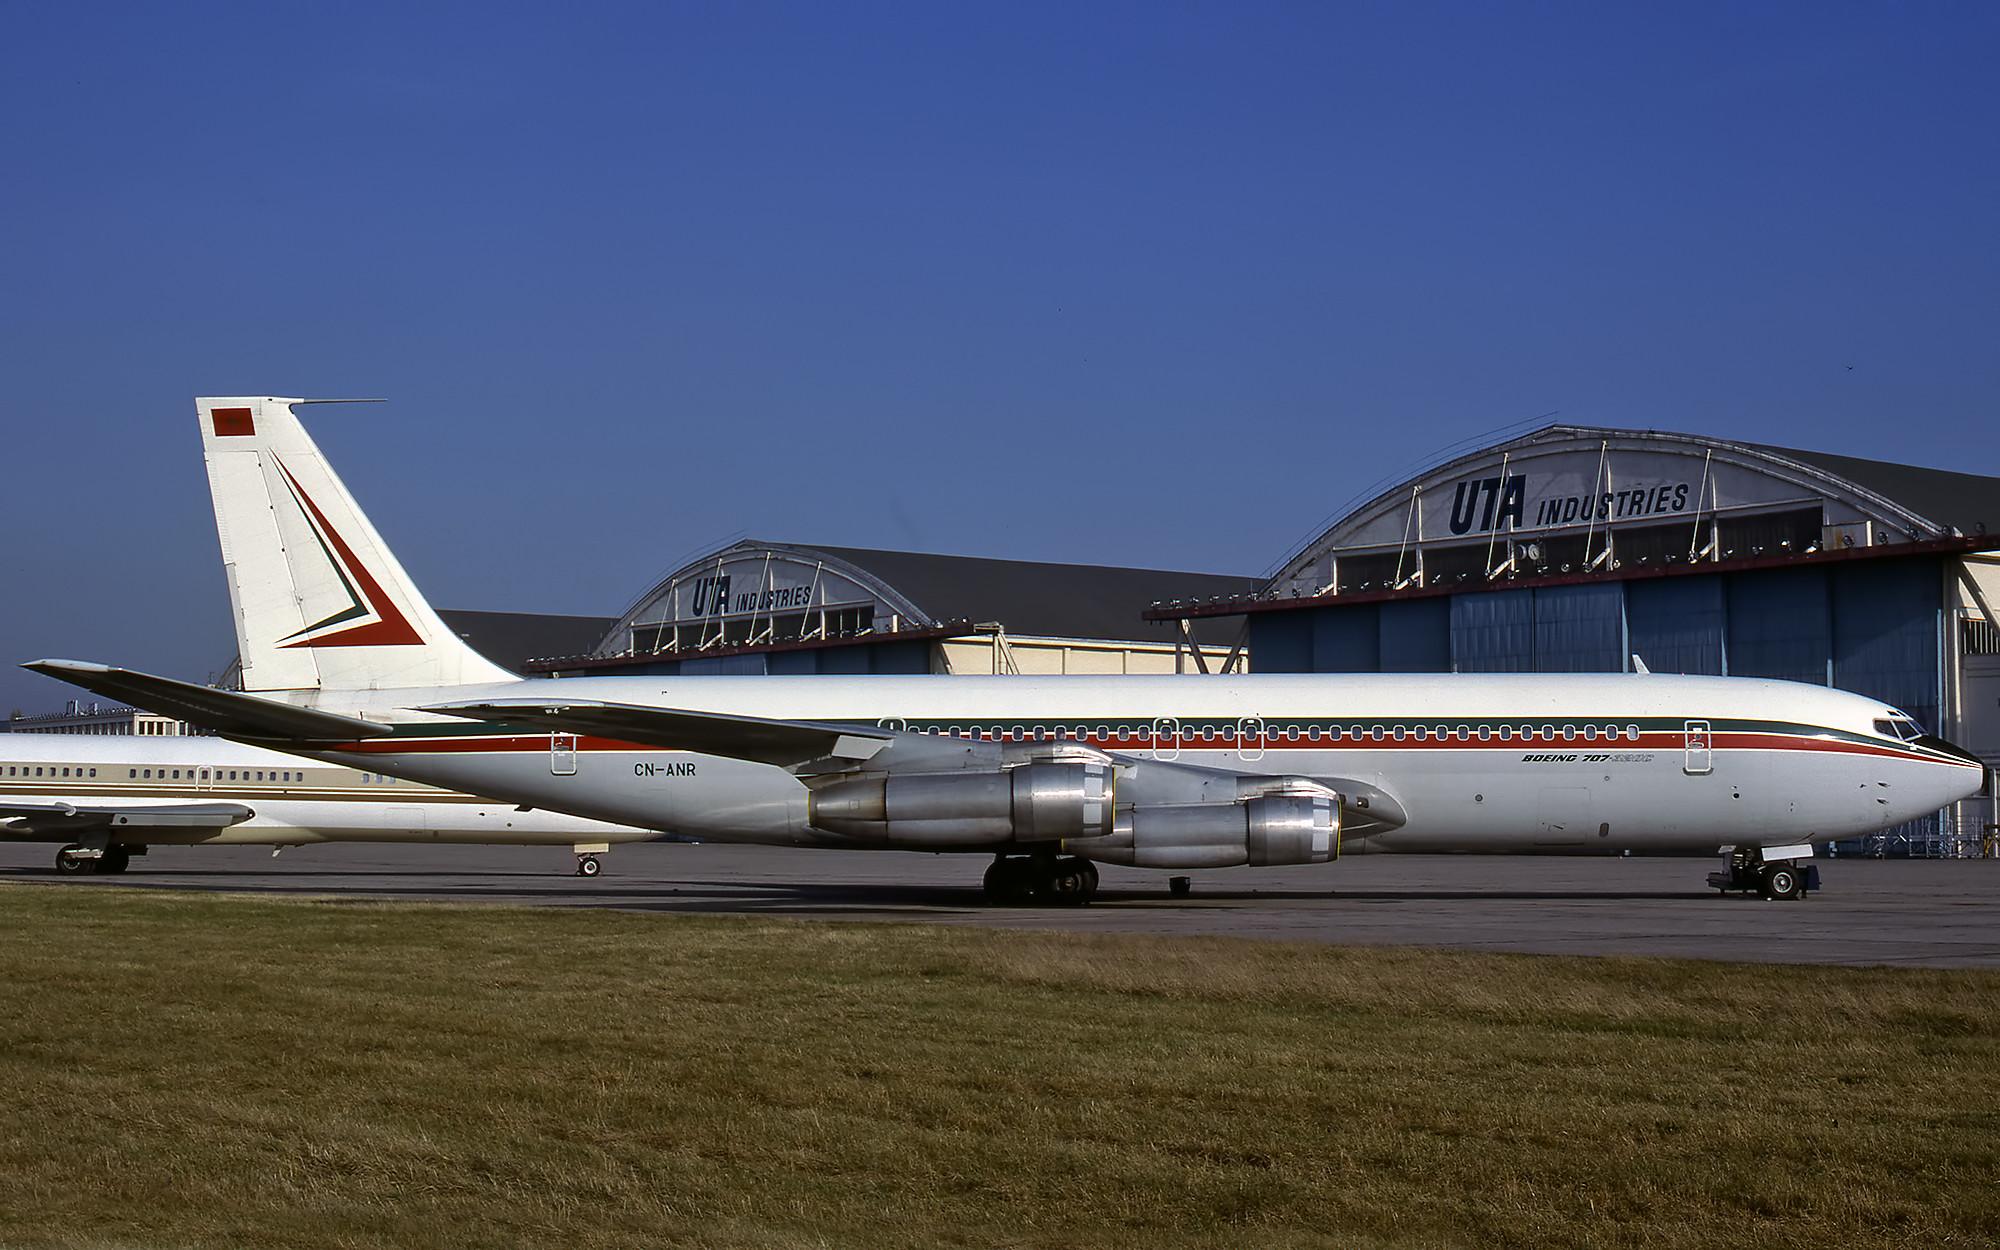 FRA: Photos anciens avions des FRA - Page 13 48315905012_9a8ac9f74a_k